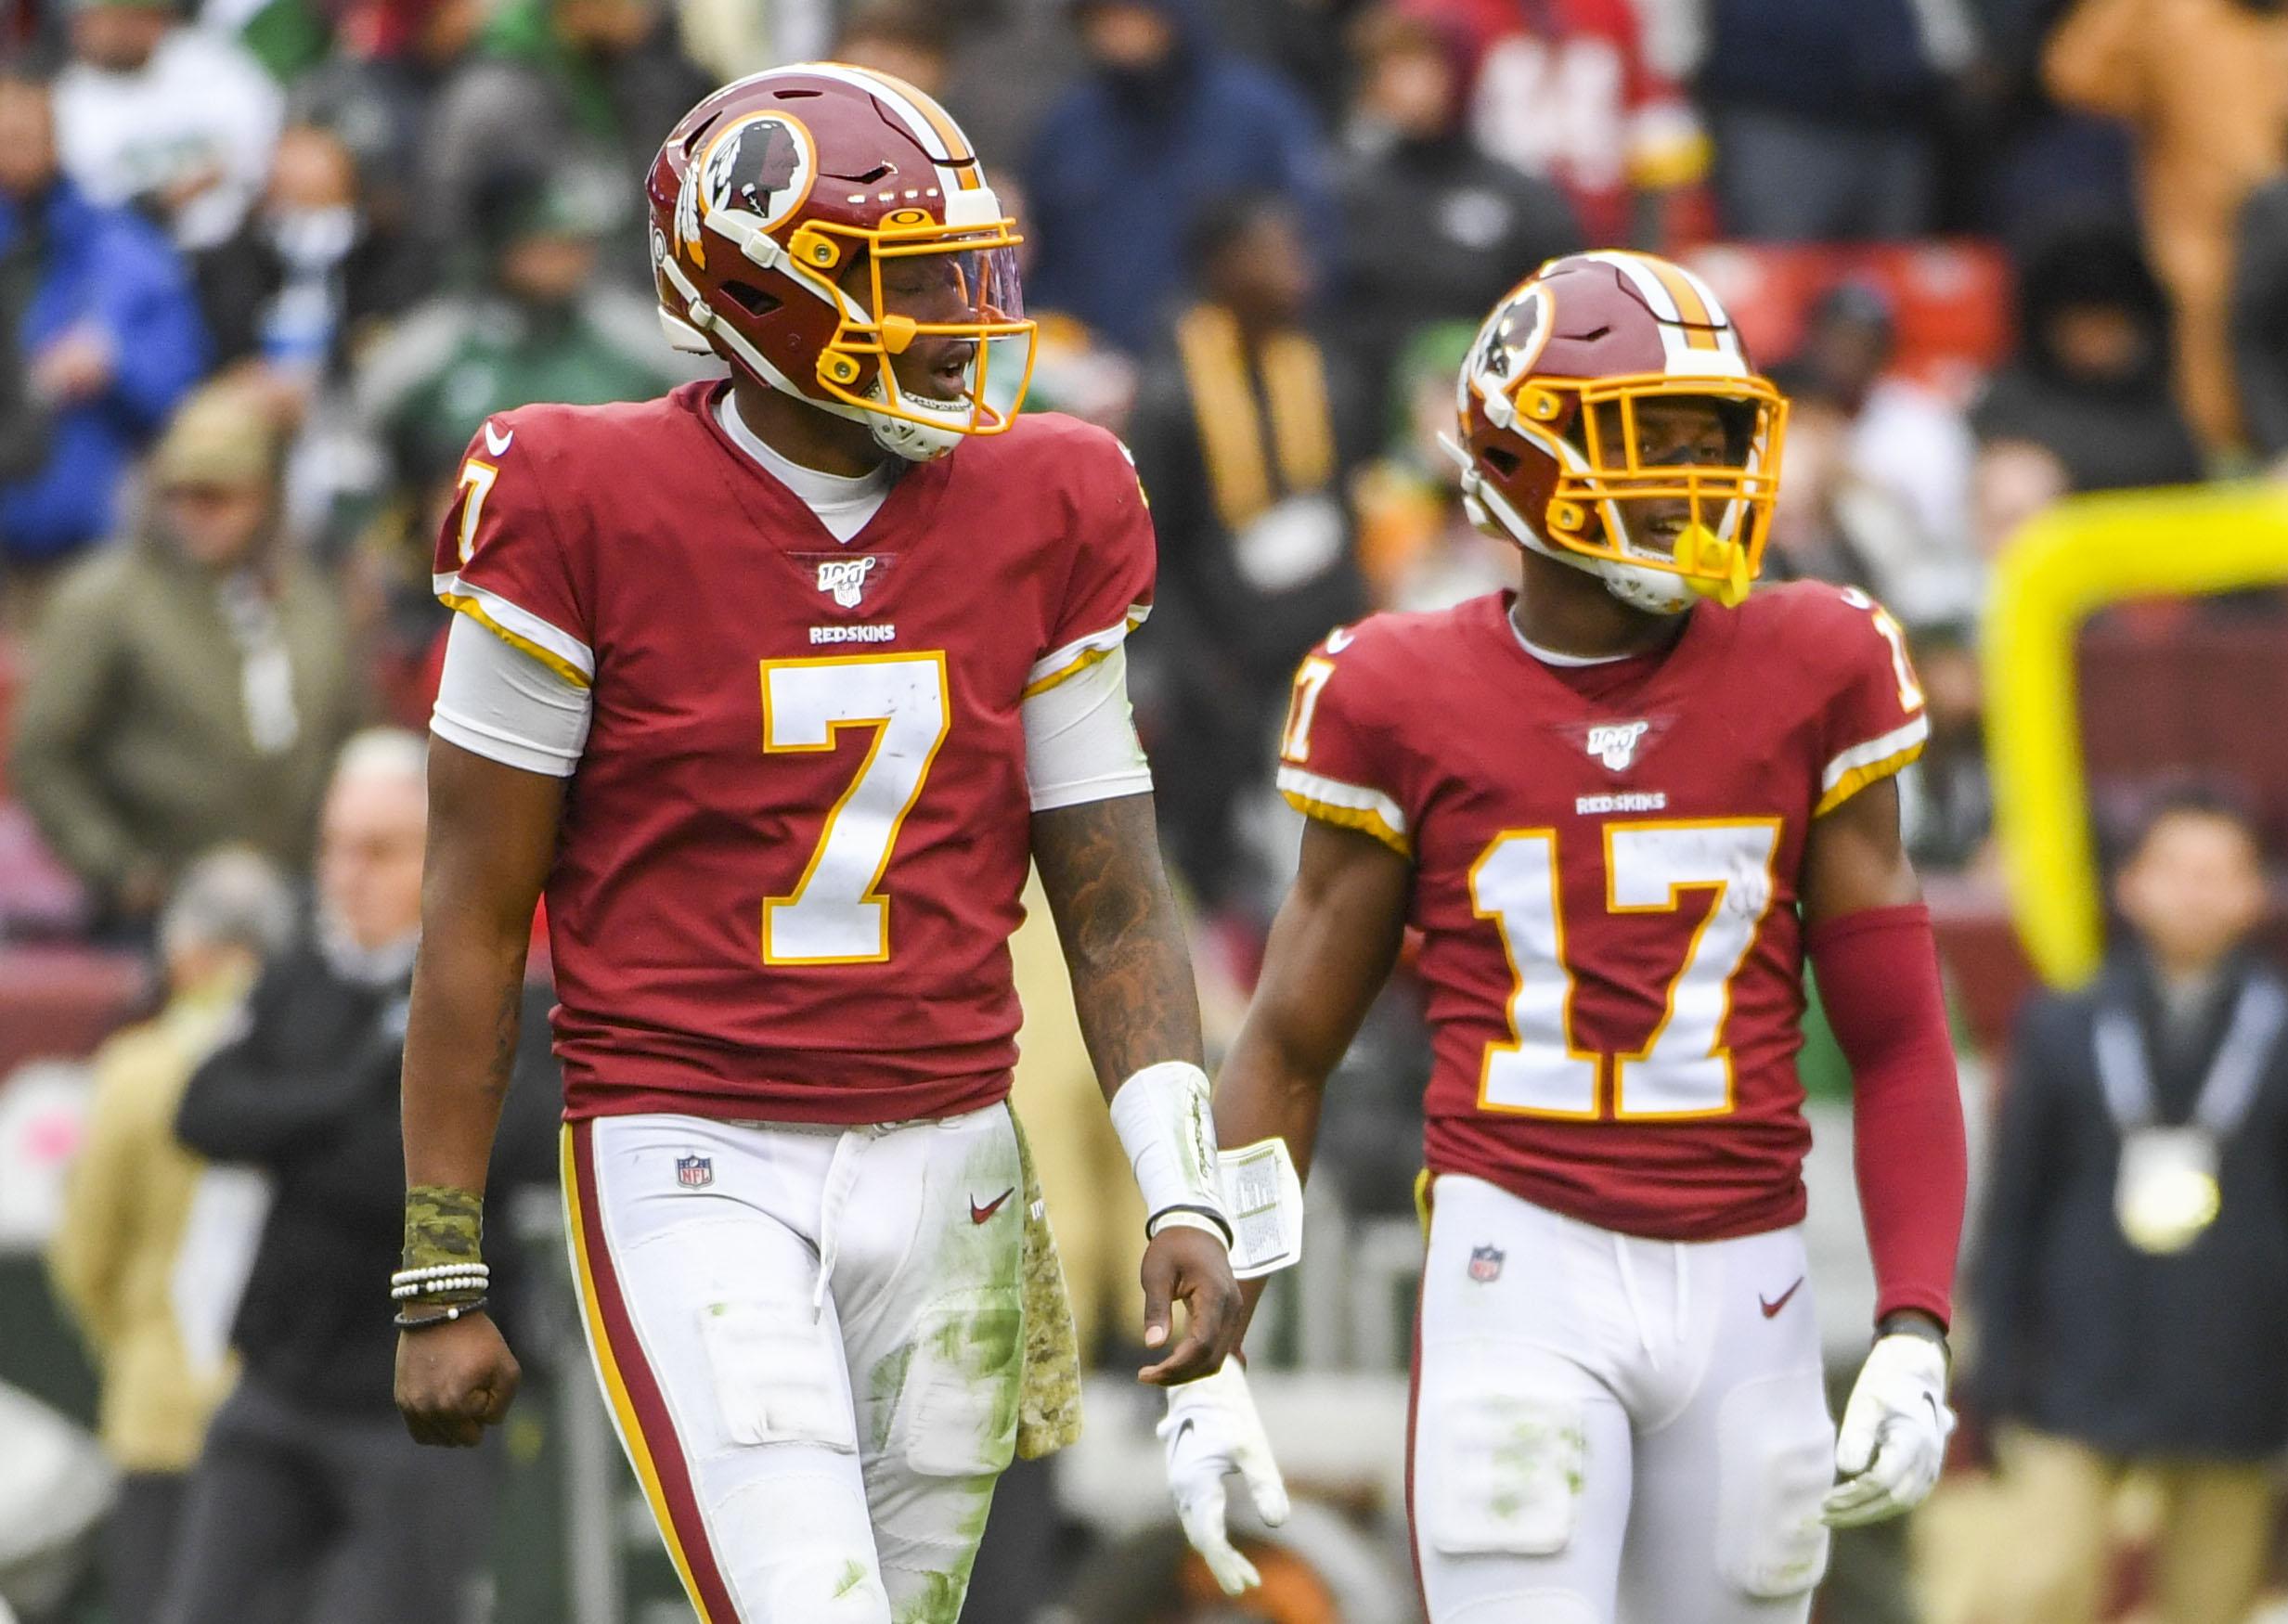 NFL-New York Jets at Washington Redskins